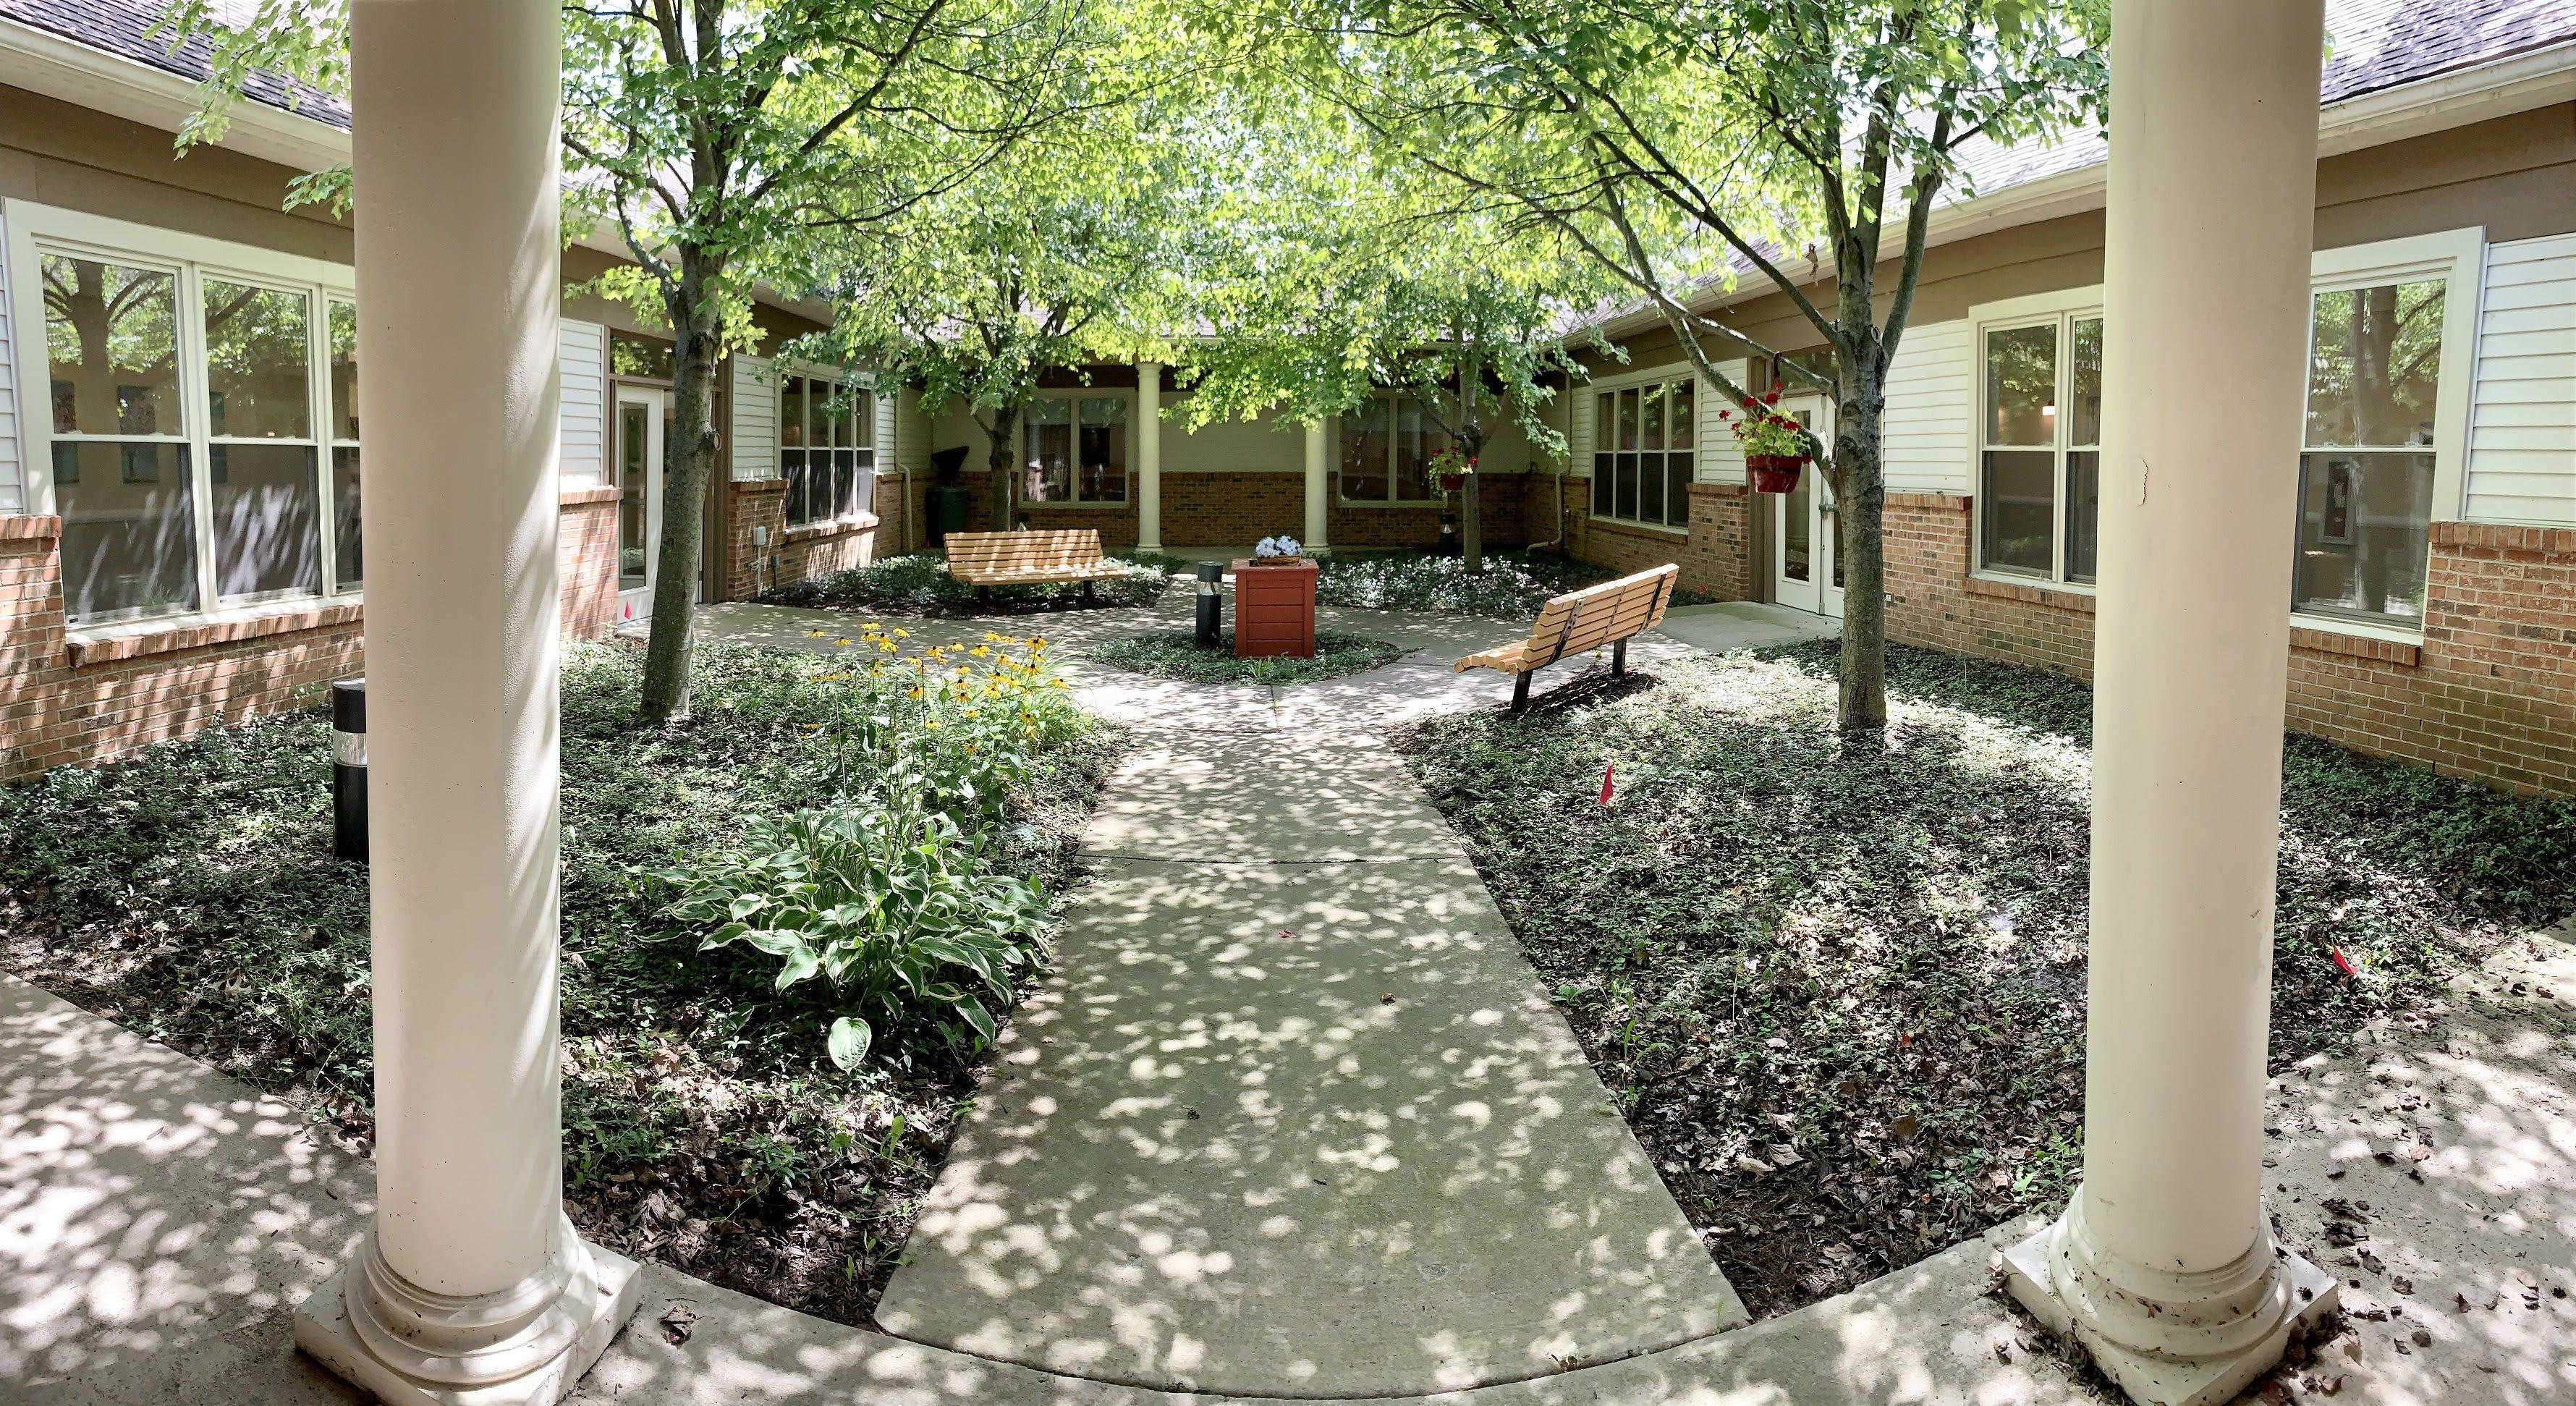 Photo 1 of Vibrant Life Superior Township